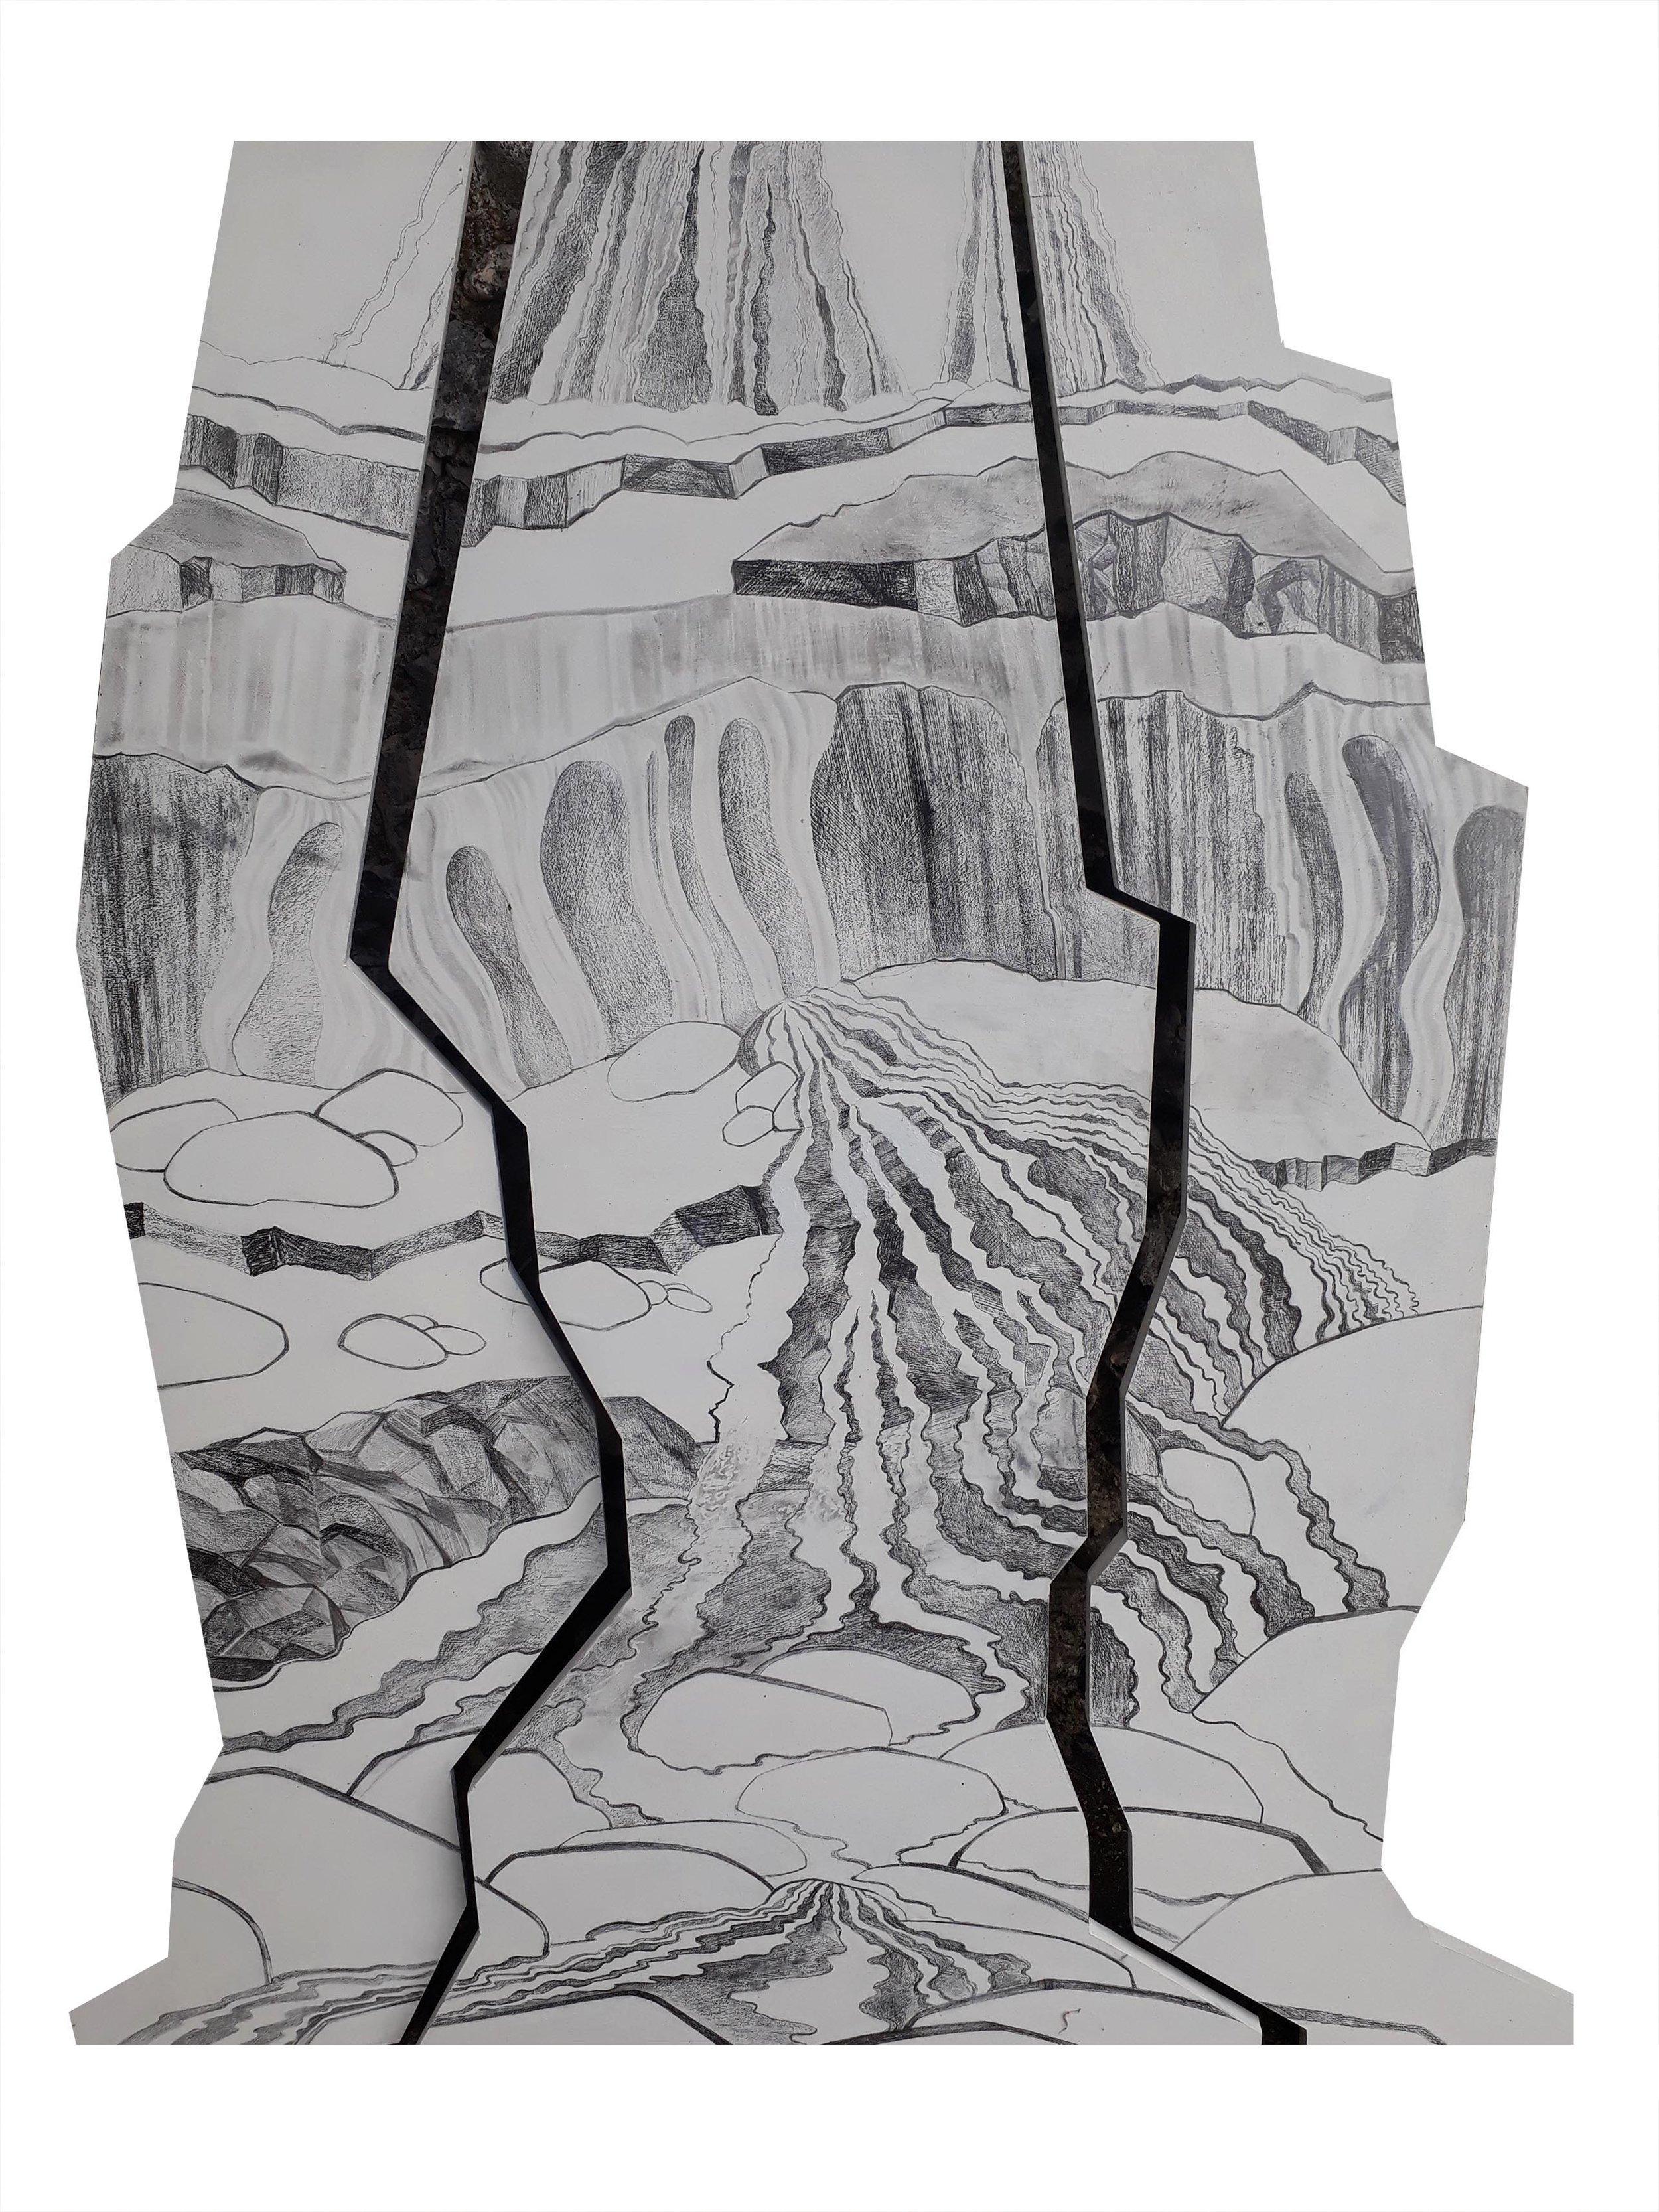 Falling Water Triptych, 2018, Graphite on MDF, 57 cm x 54 cm, 32 cm x 80 cm, $175 + postage